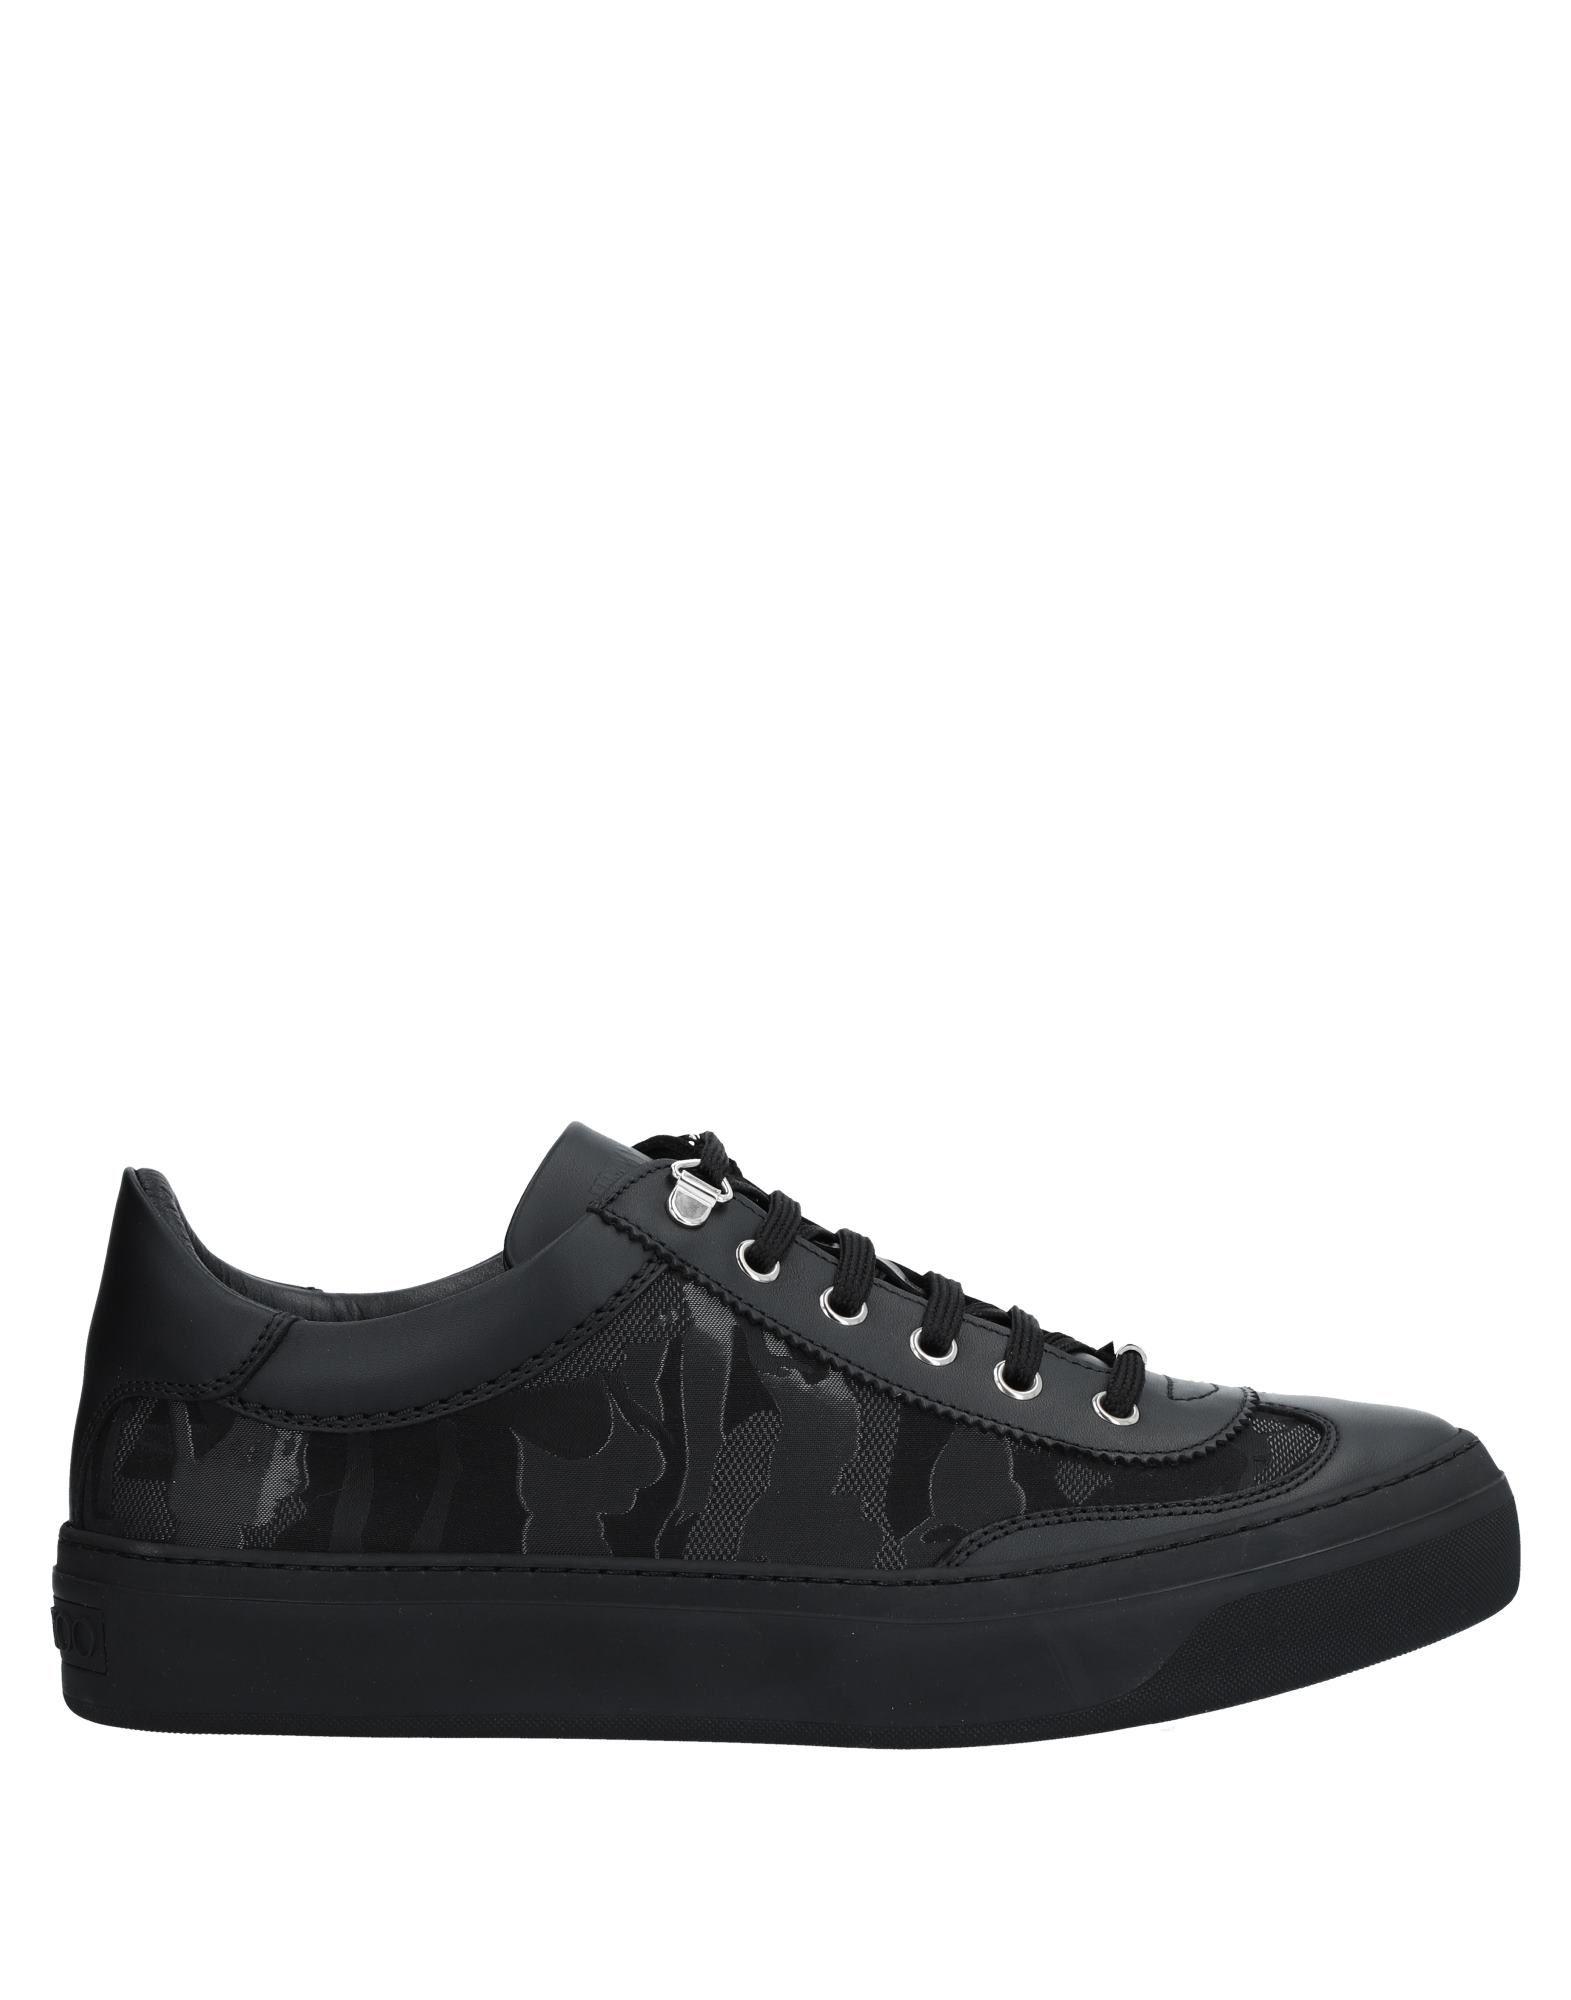 Jimmy Choo Sneakers Herren  11462829JH Gute Qualität beliebte Schuhe